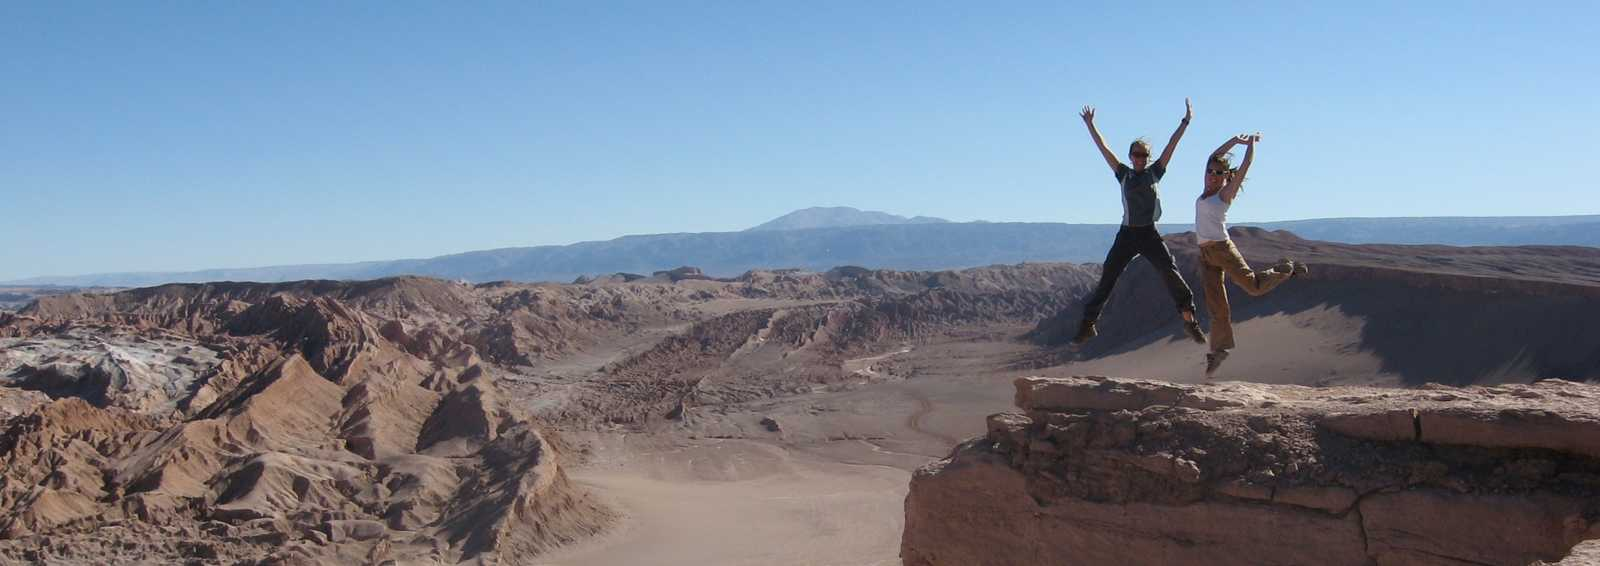 Jumping for joy in the Atacama Desert, Bolivia